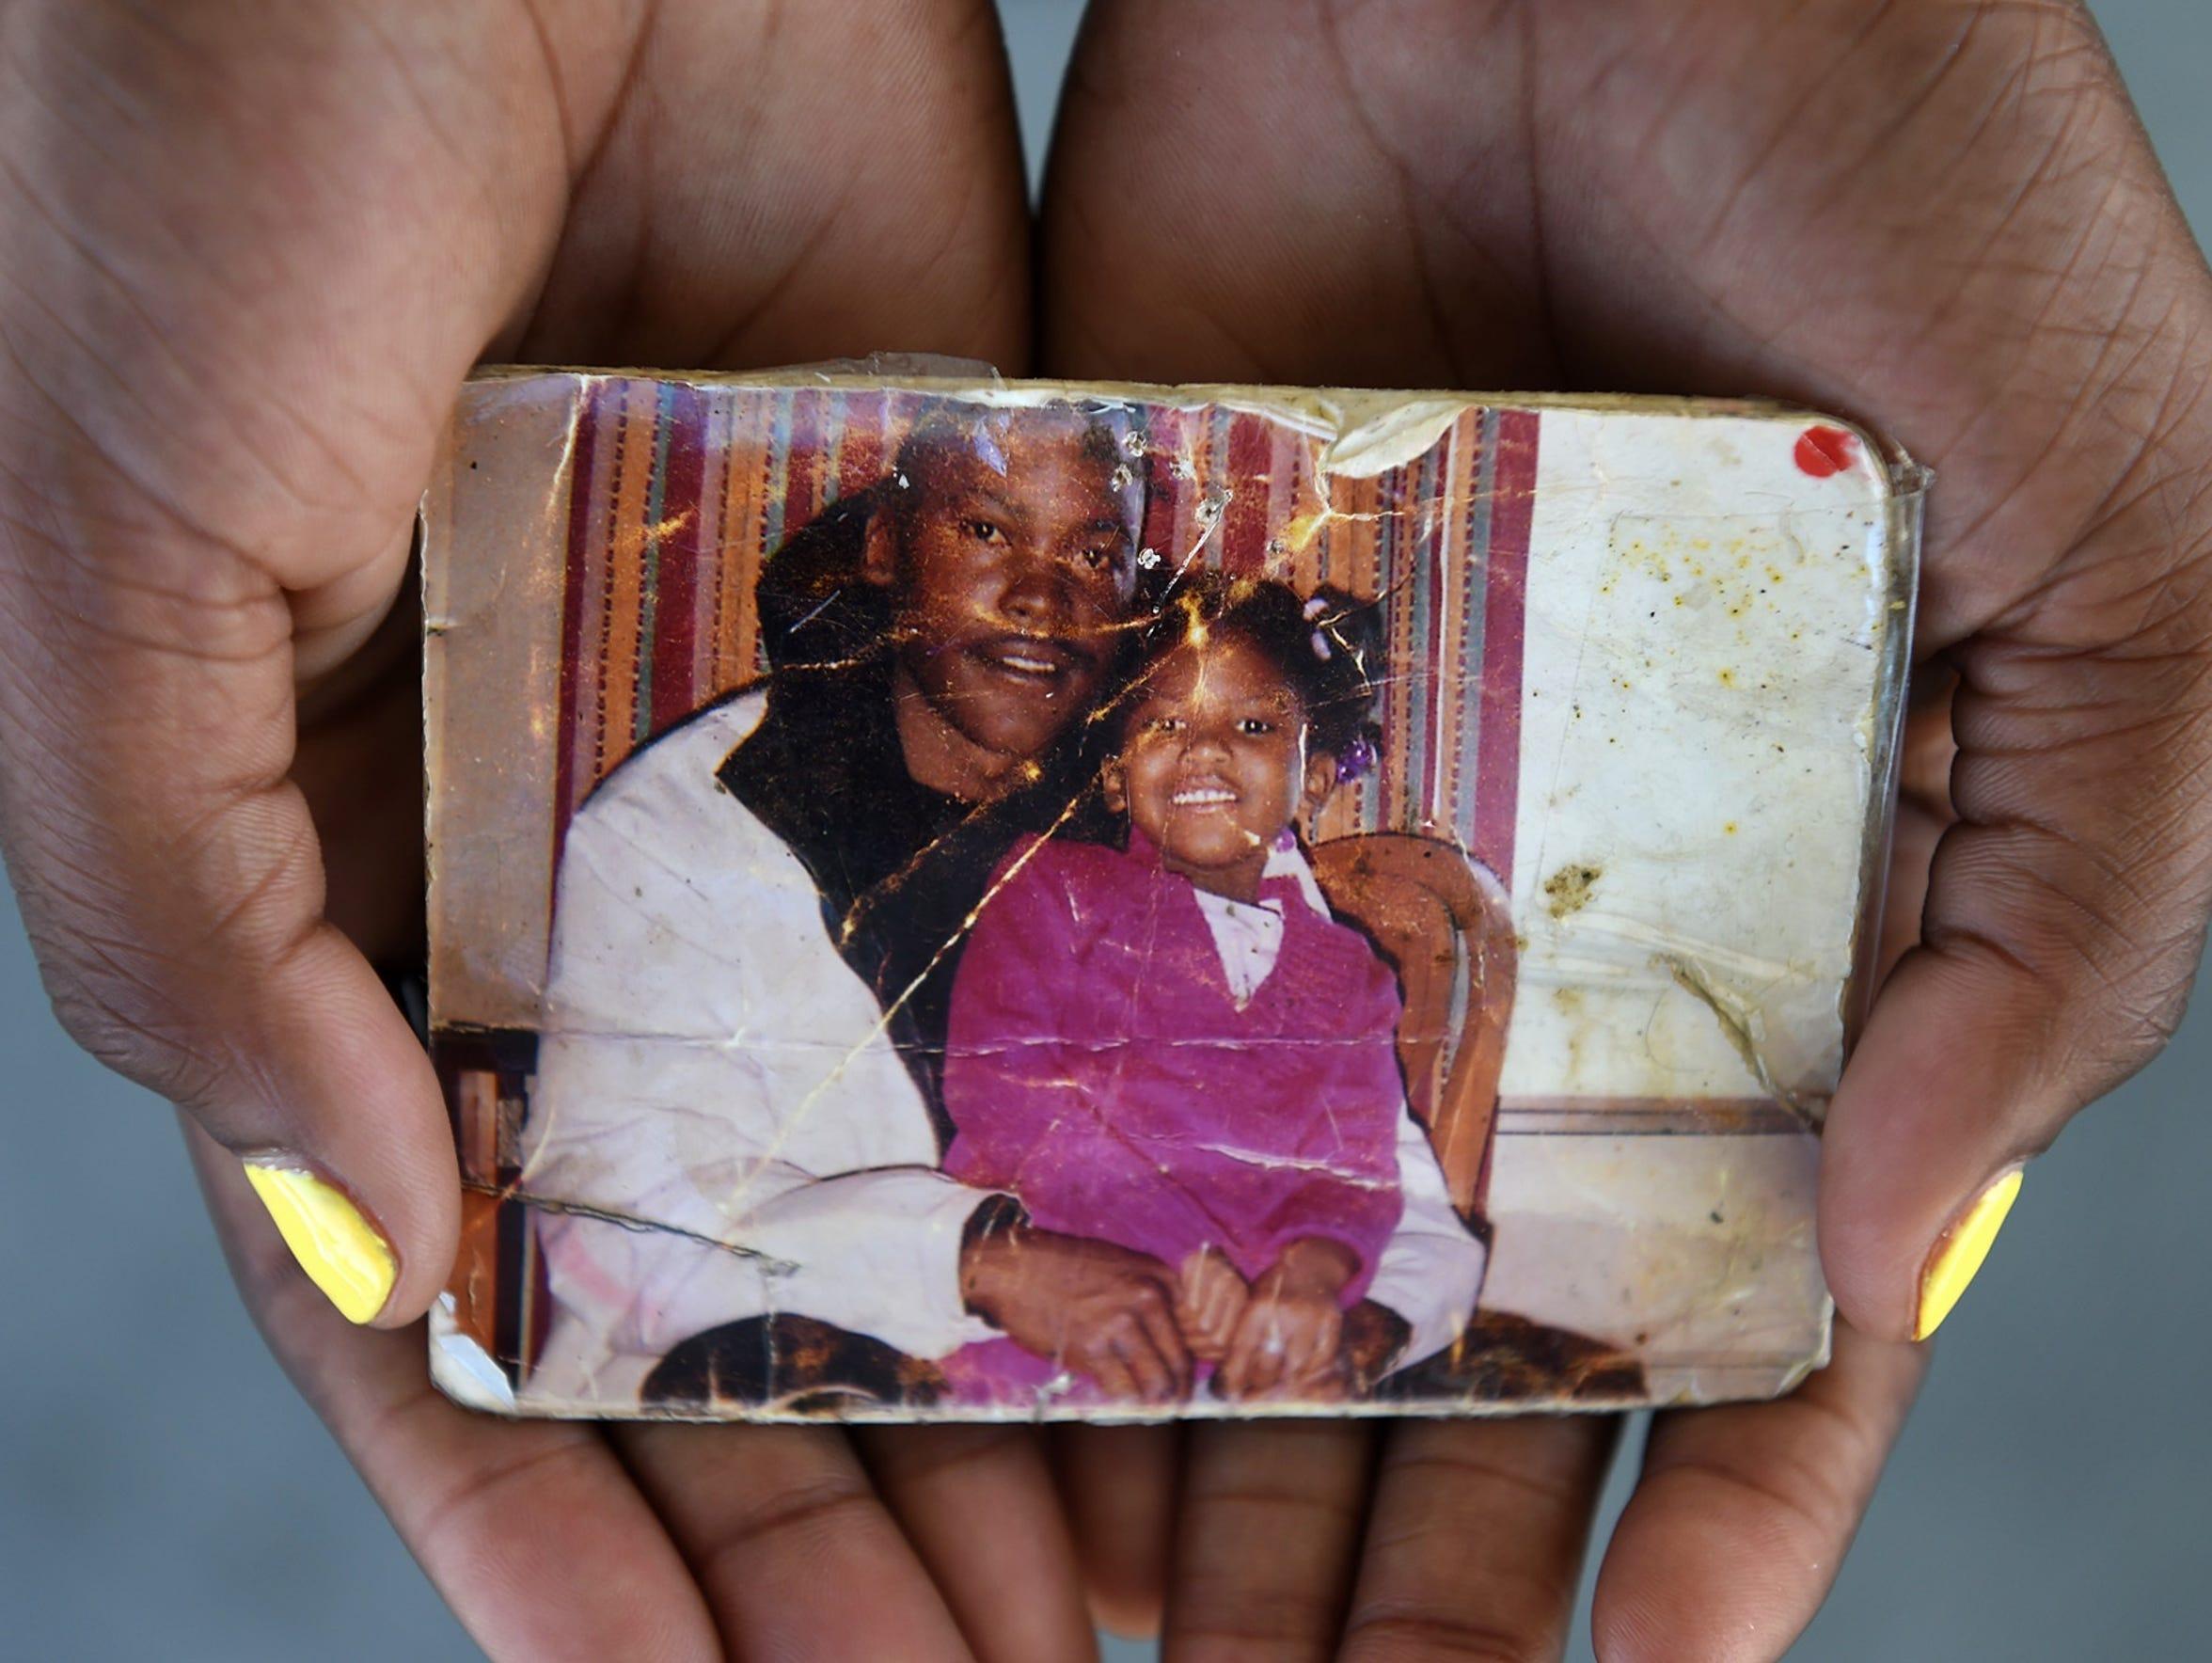 Davi'Ana Kirkland, 17, holds a photograph of her and